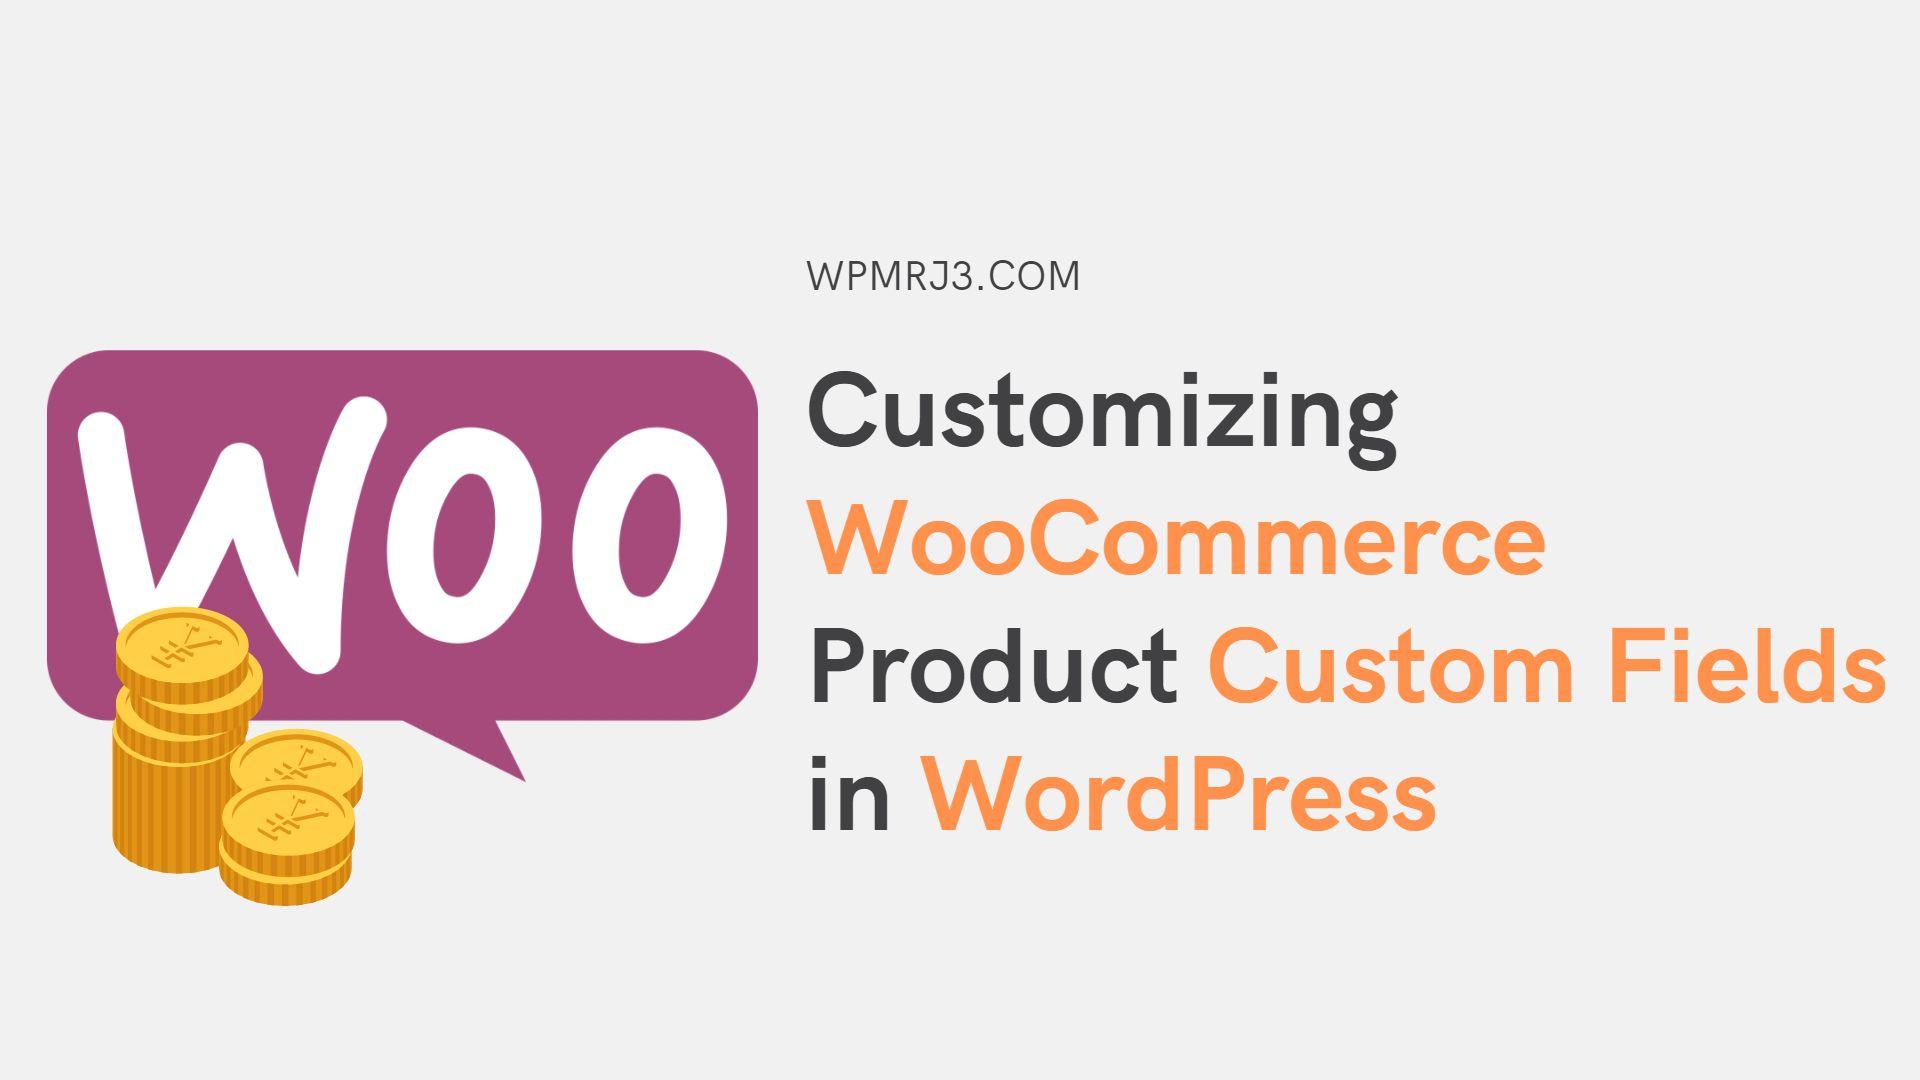 Customizing WooCommerce Product Custom Fields in WordPress